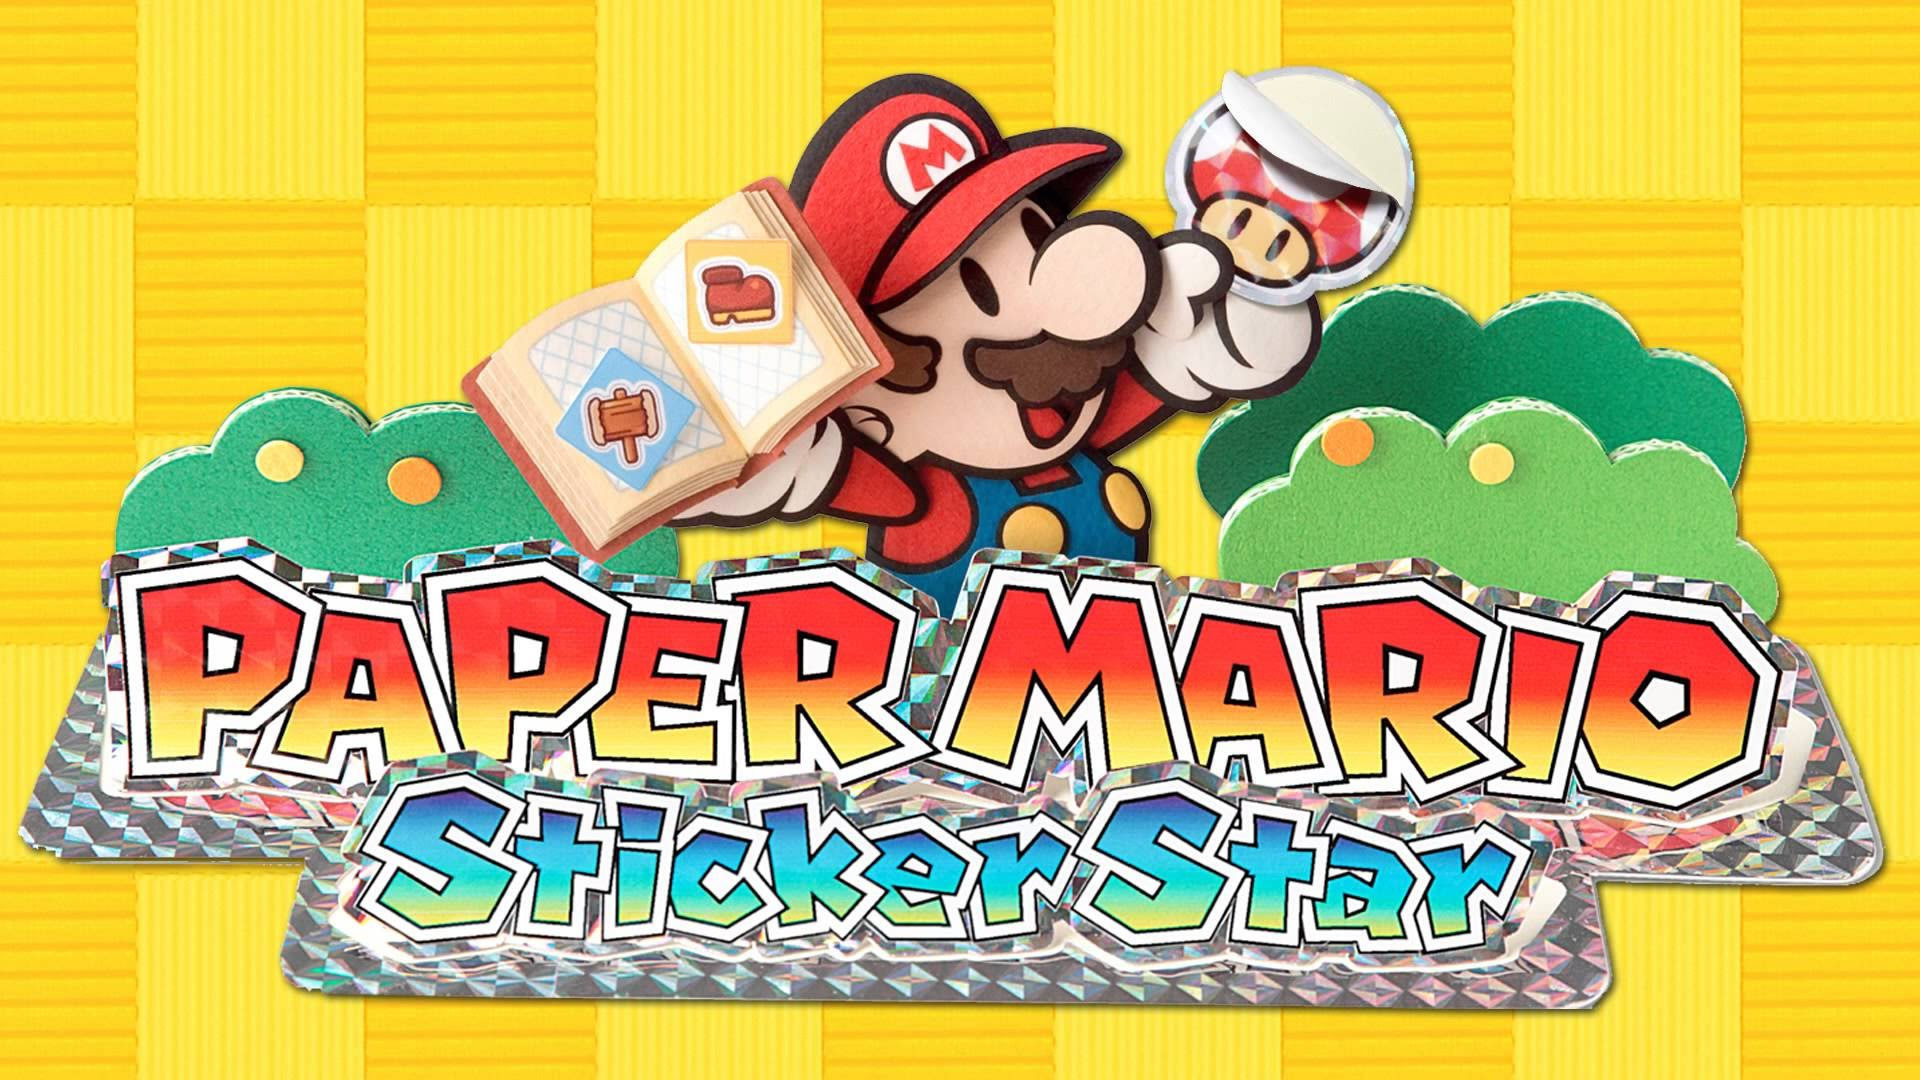 Megasparkle Goomba - Paper Mario: Sticker Star